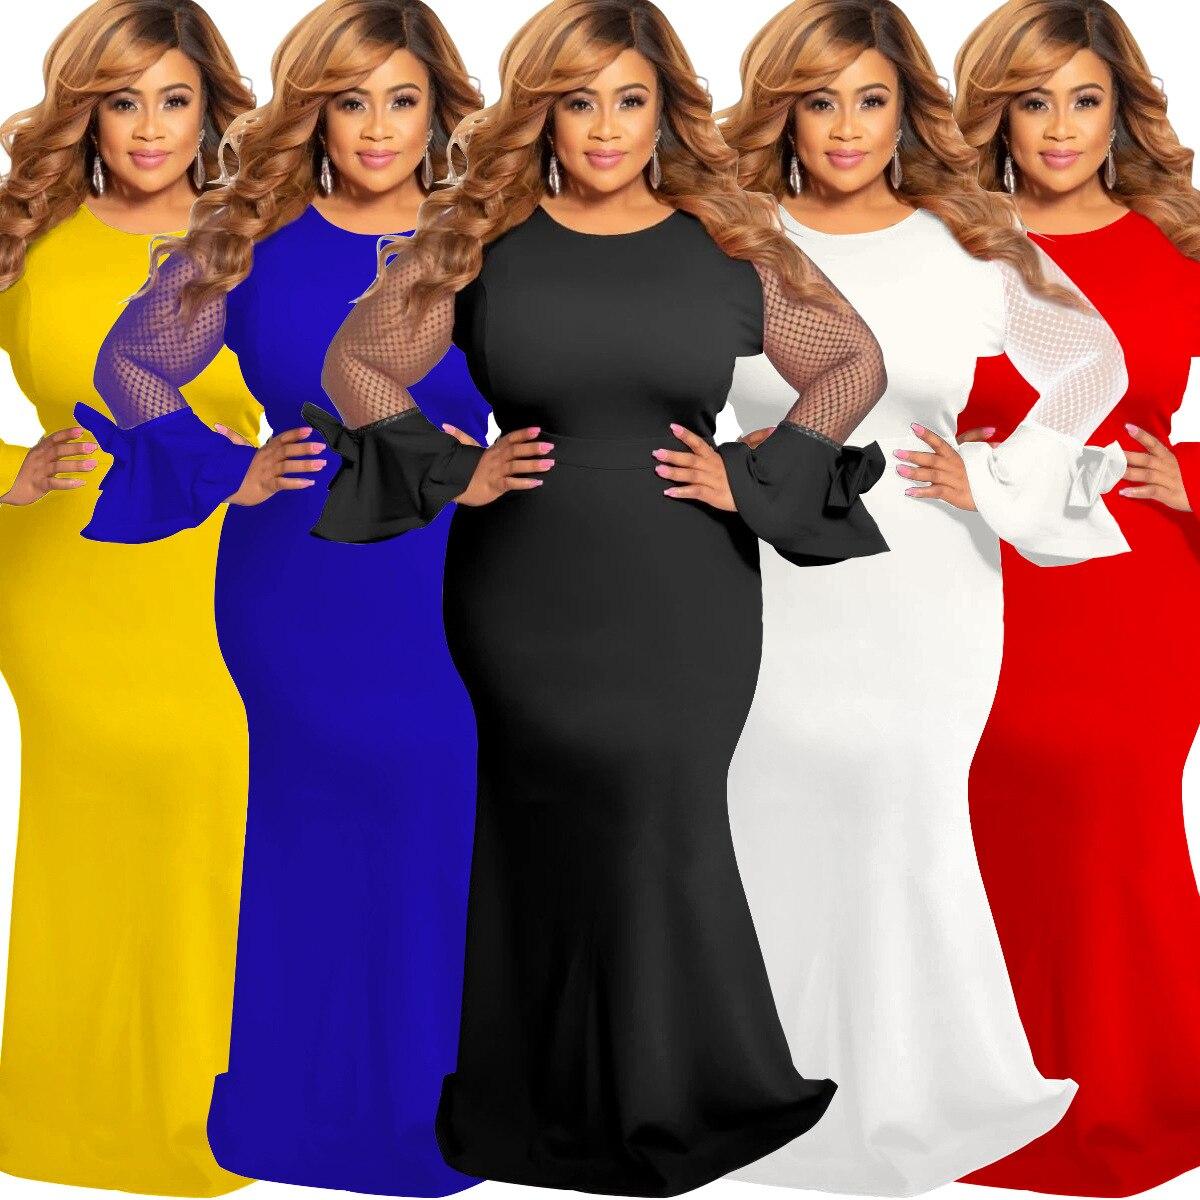 2019 Autumn Elegent Fashion Style African Women Beauty Plus Size Long Dress S-5XL